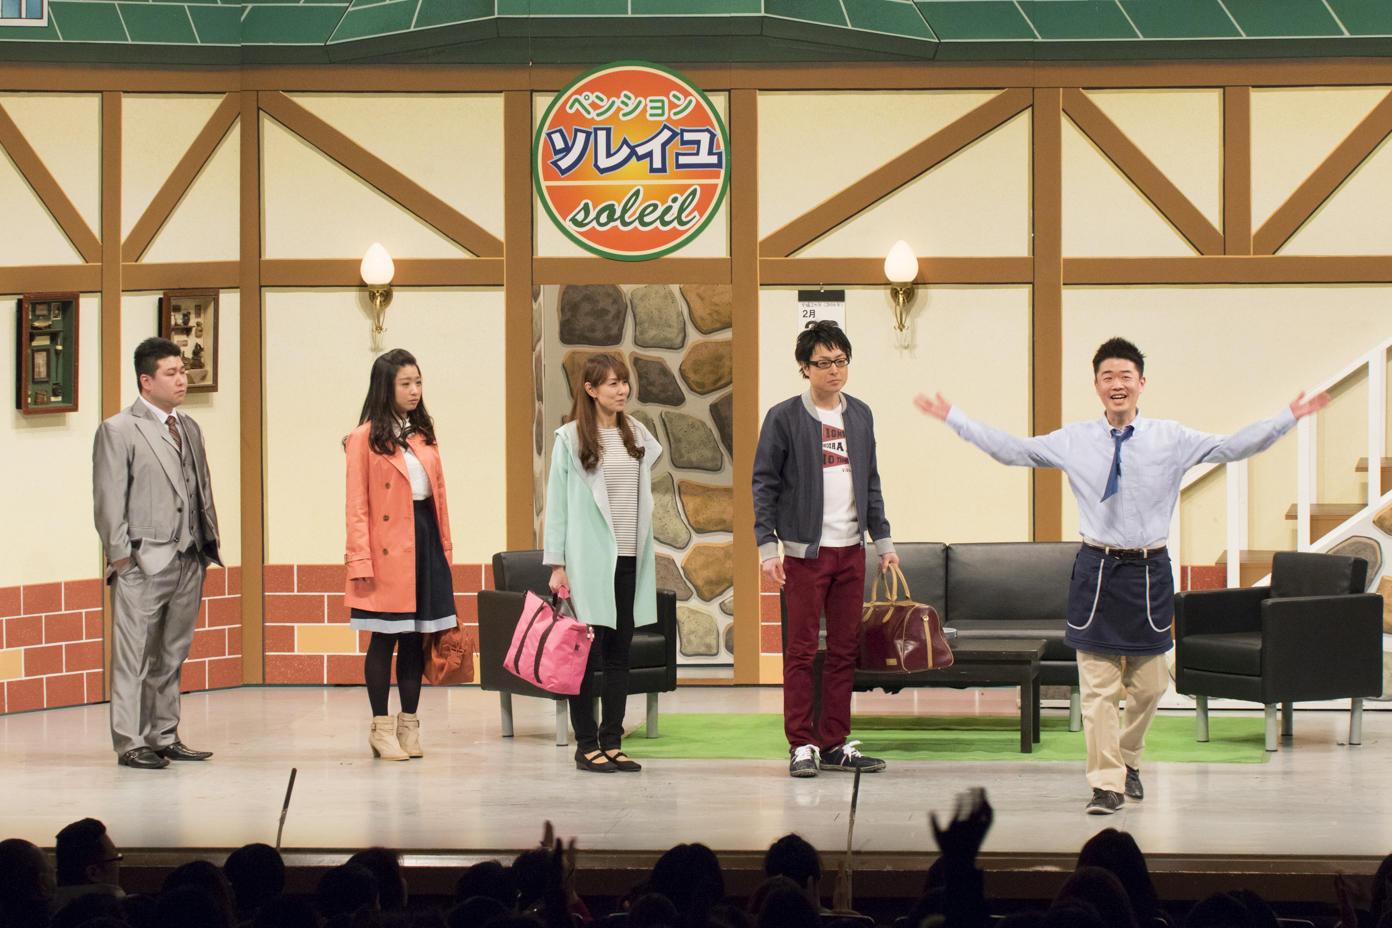 http://news.yoshimoto.co.jp/20160228174906-80426c989bc6847e5ade2113dd874c24bf752533.jpg